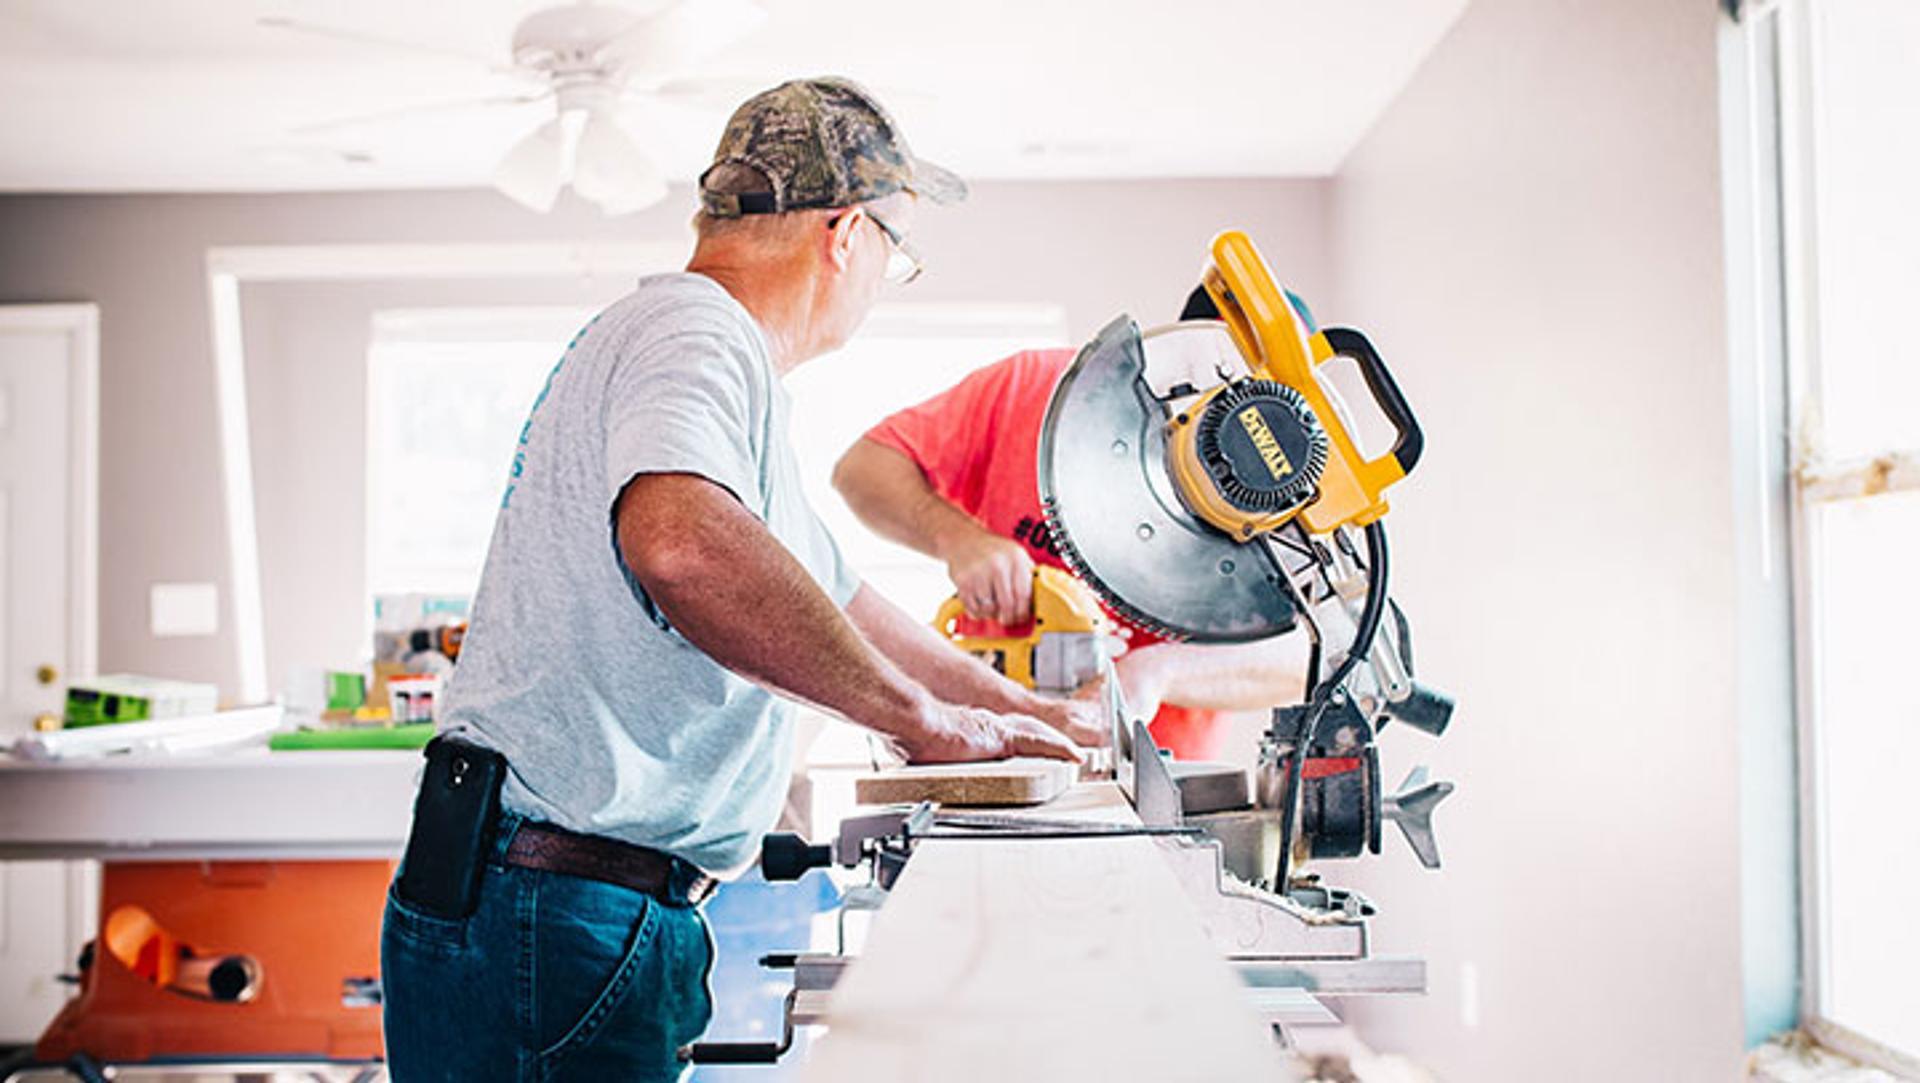 I'm making home renovations – should I get a loan or a credit card?